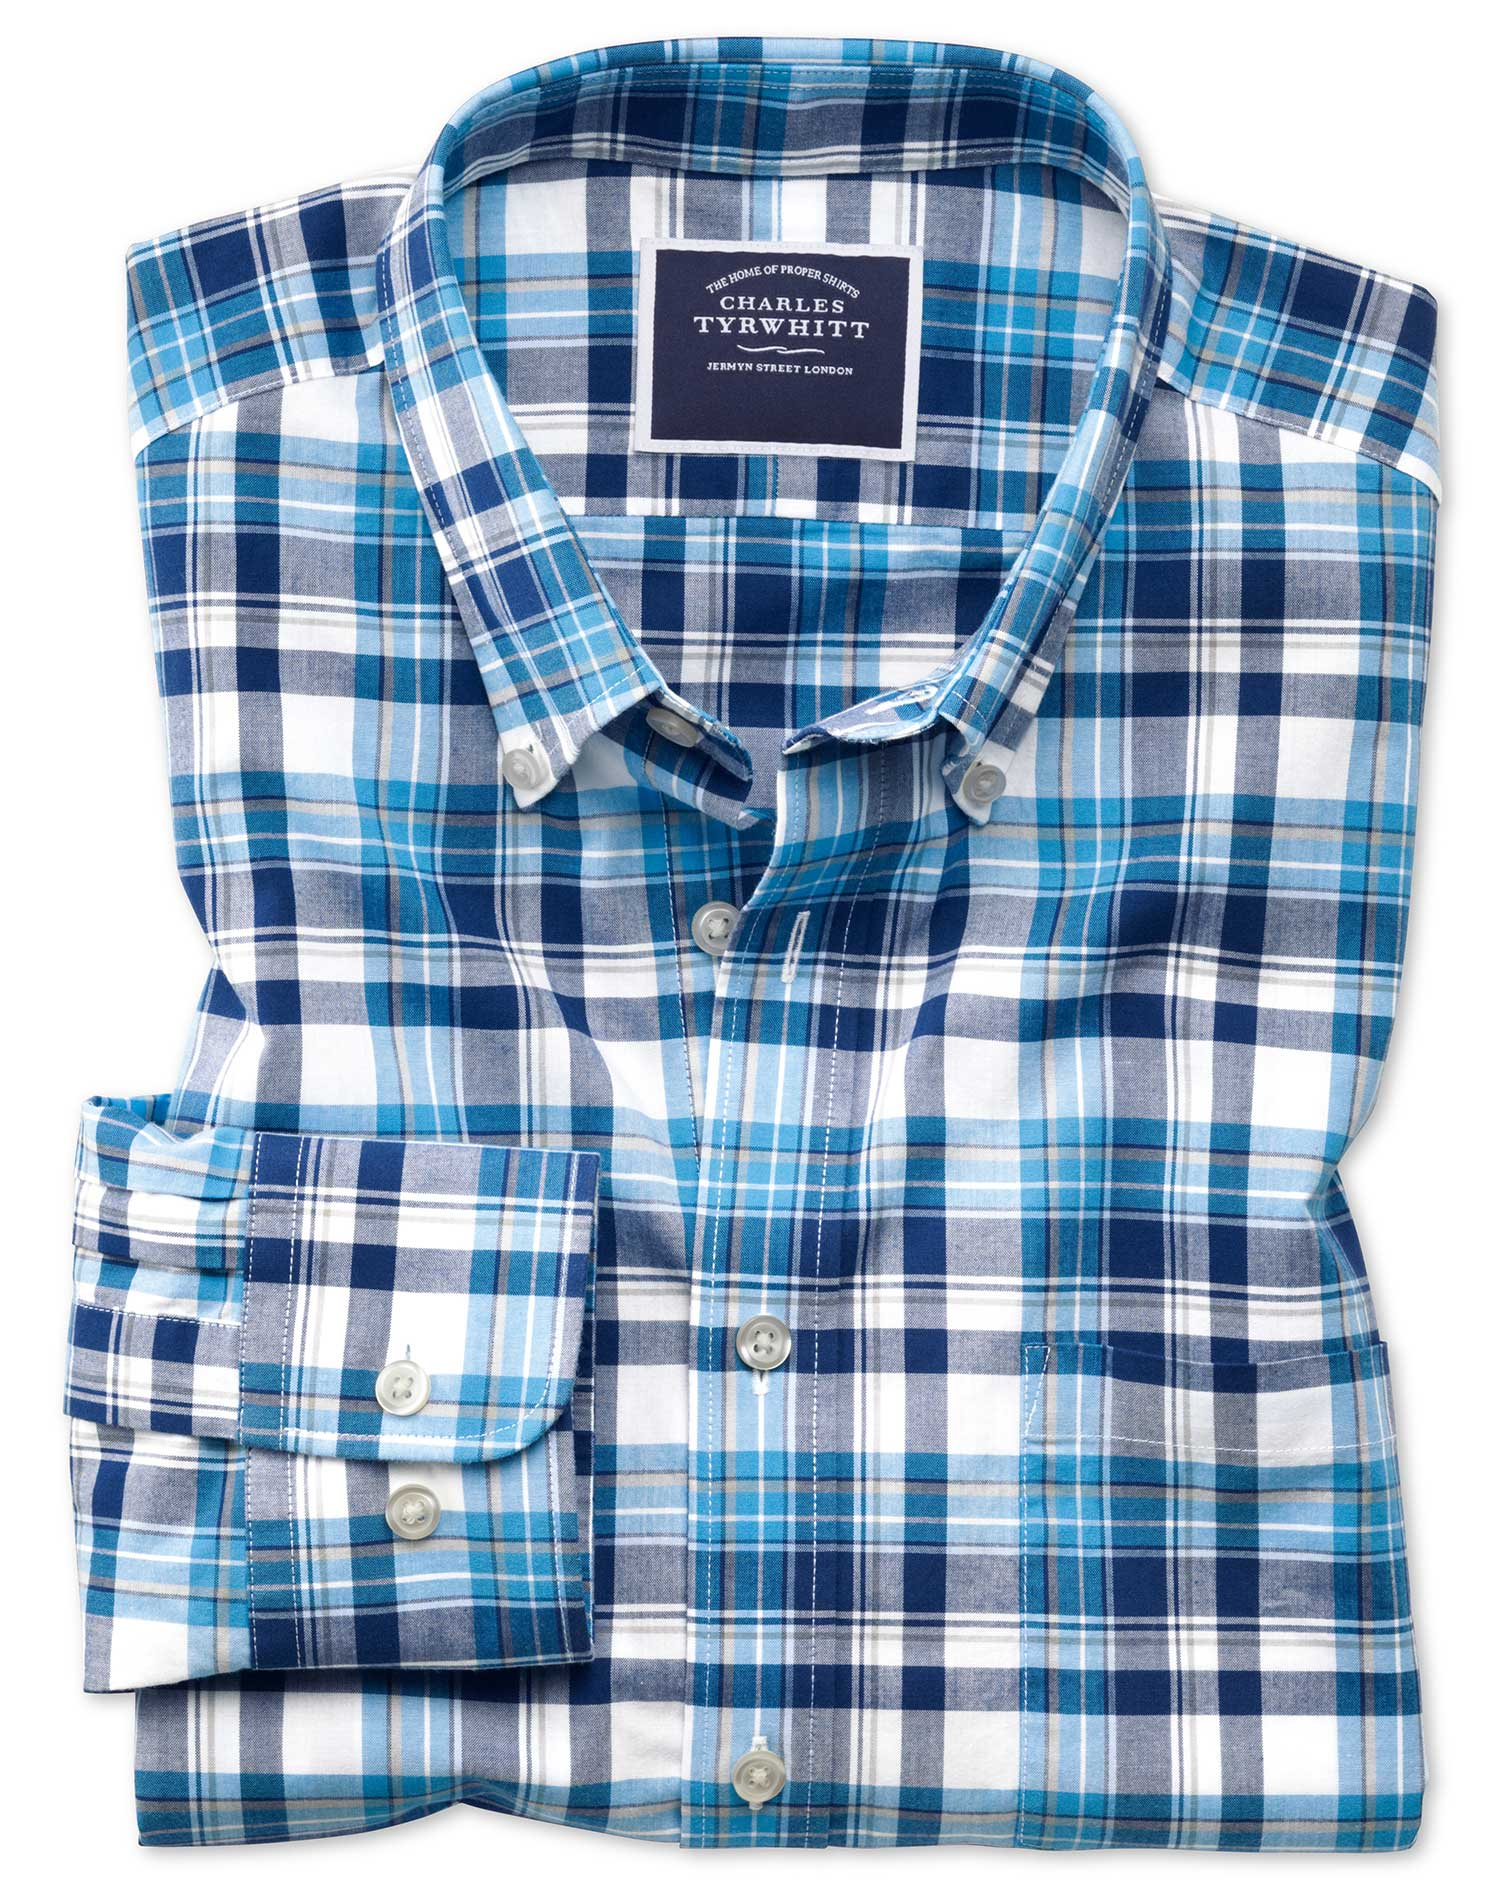 Classic Fit Poplin Navy Multi Cotton Shirt Single Cuff Size XL by Charles Tyrwhitt